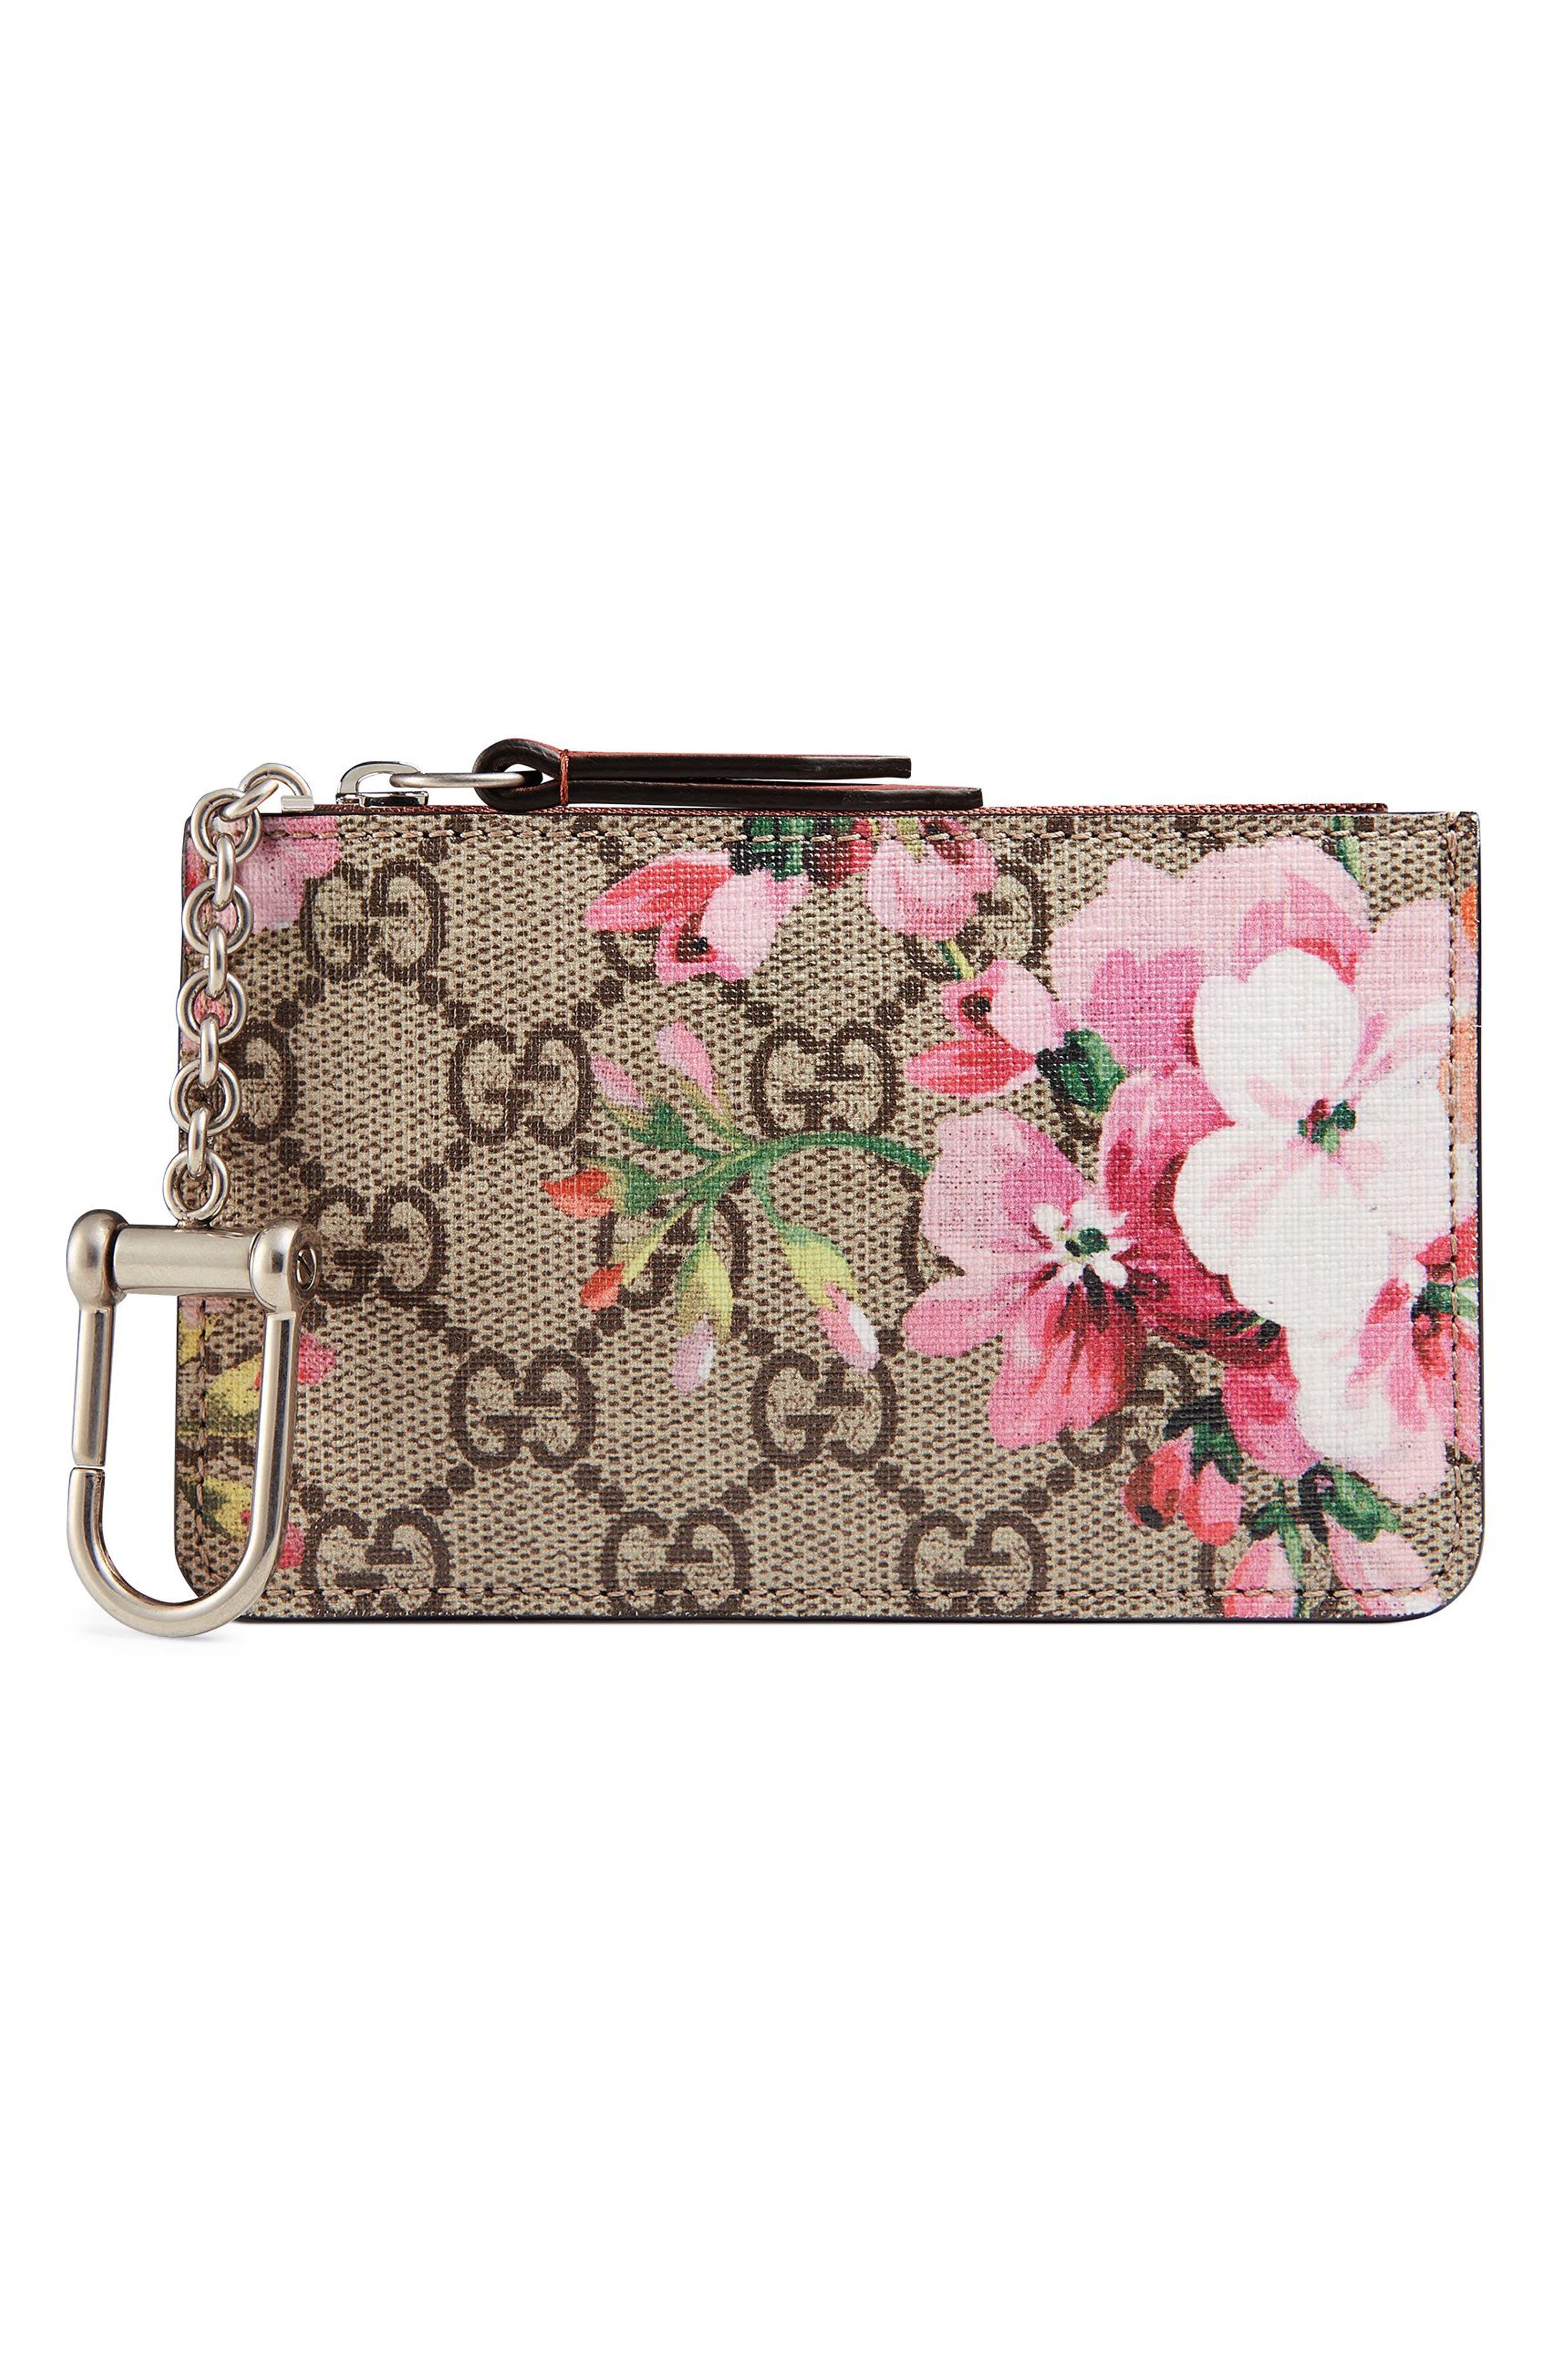 gucci key pouch. main image - gucci blooms key case pouch w